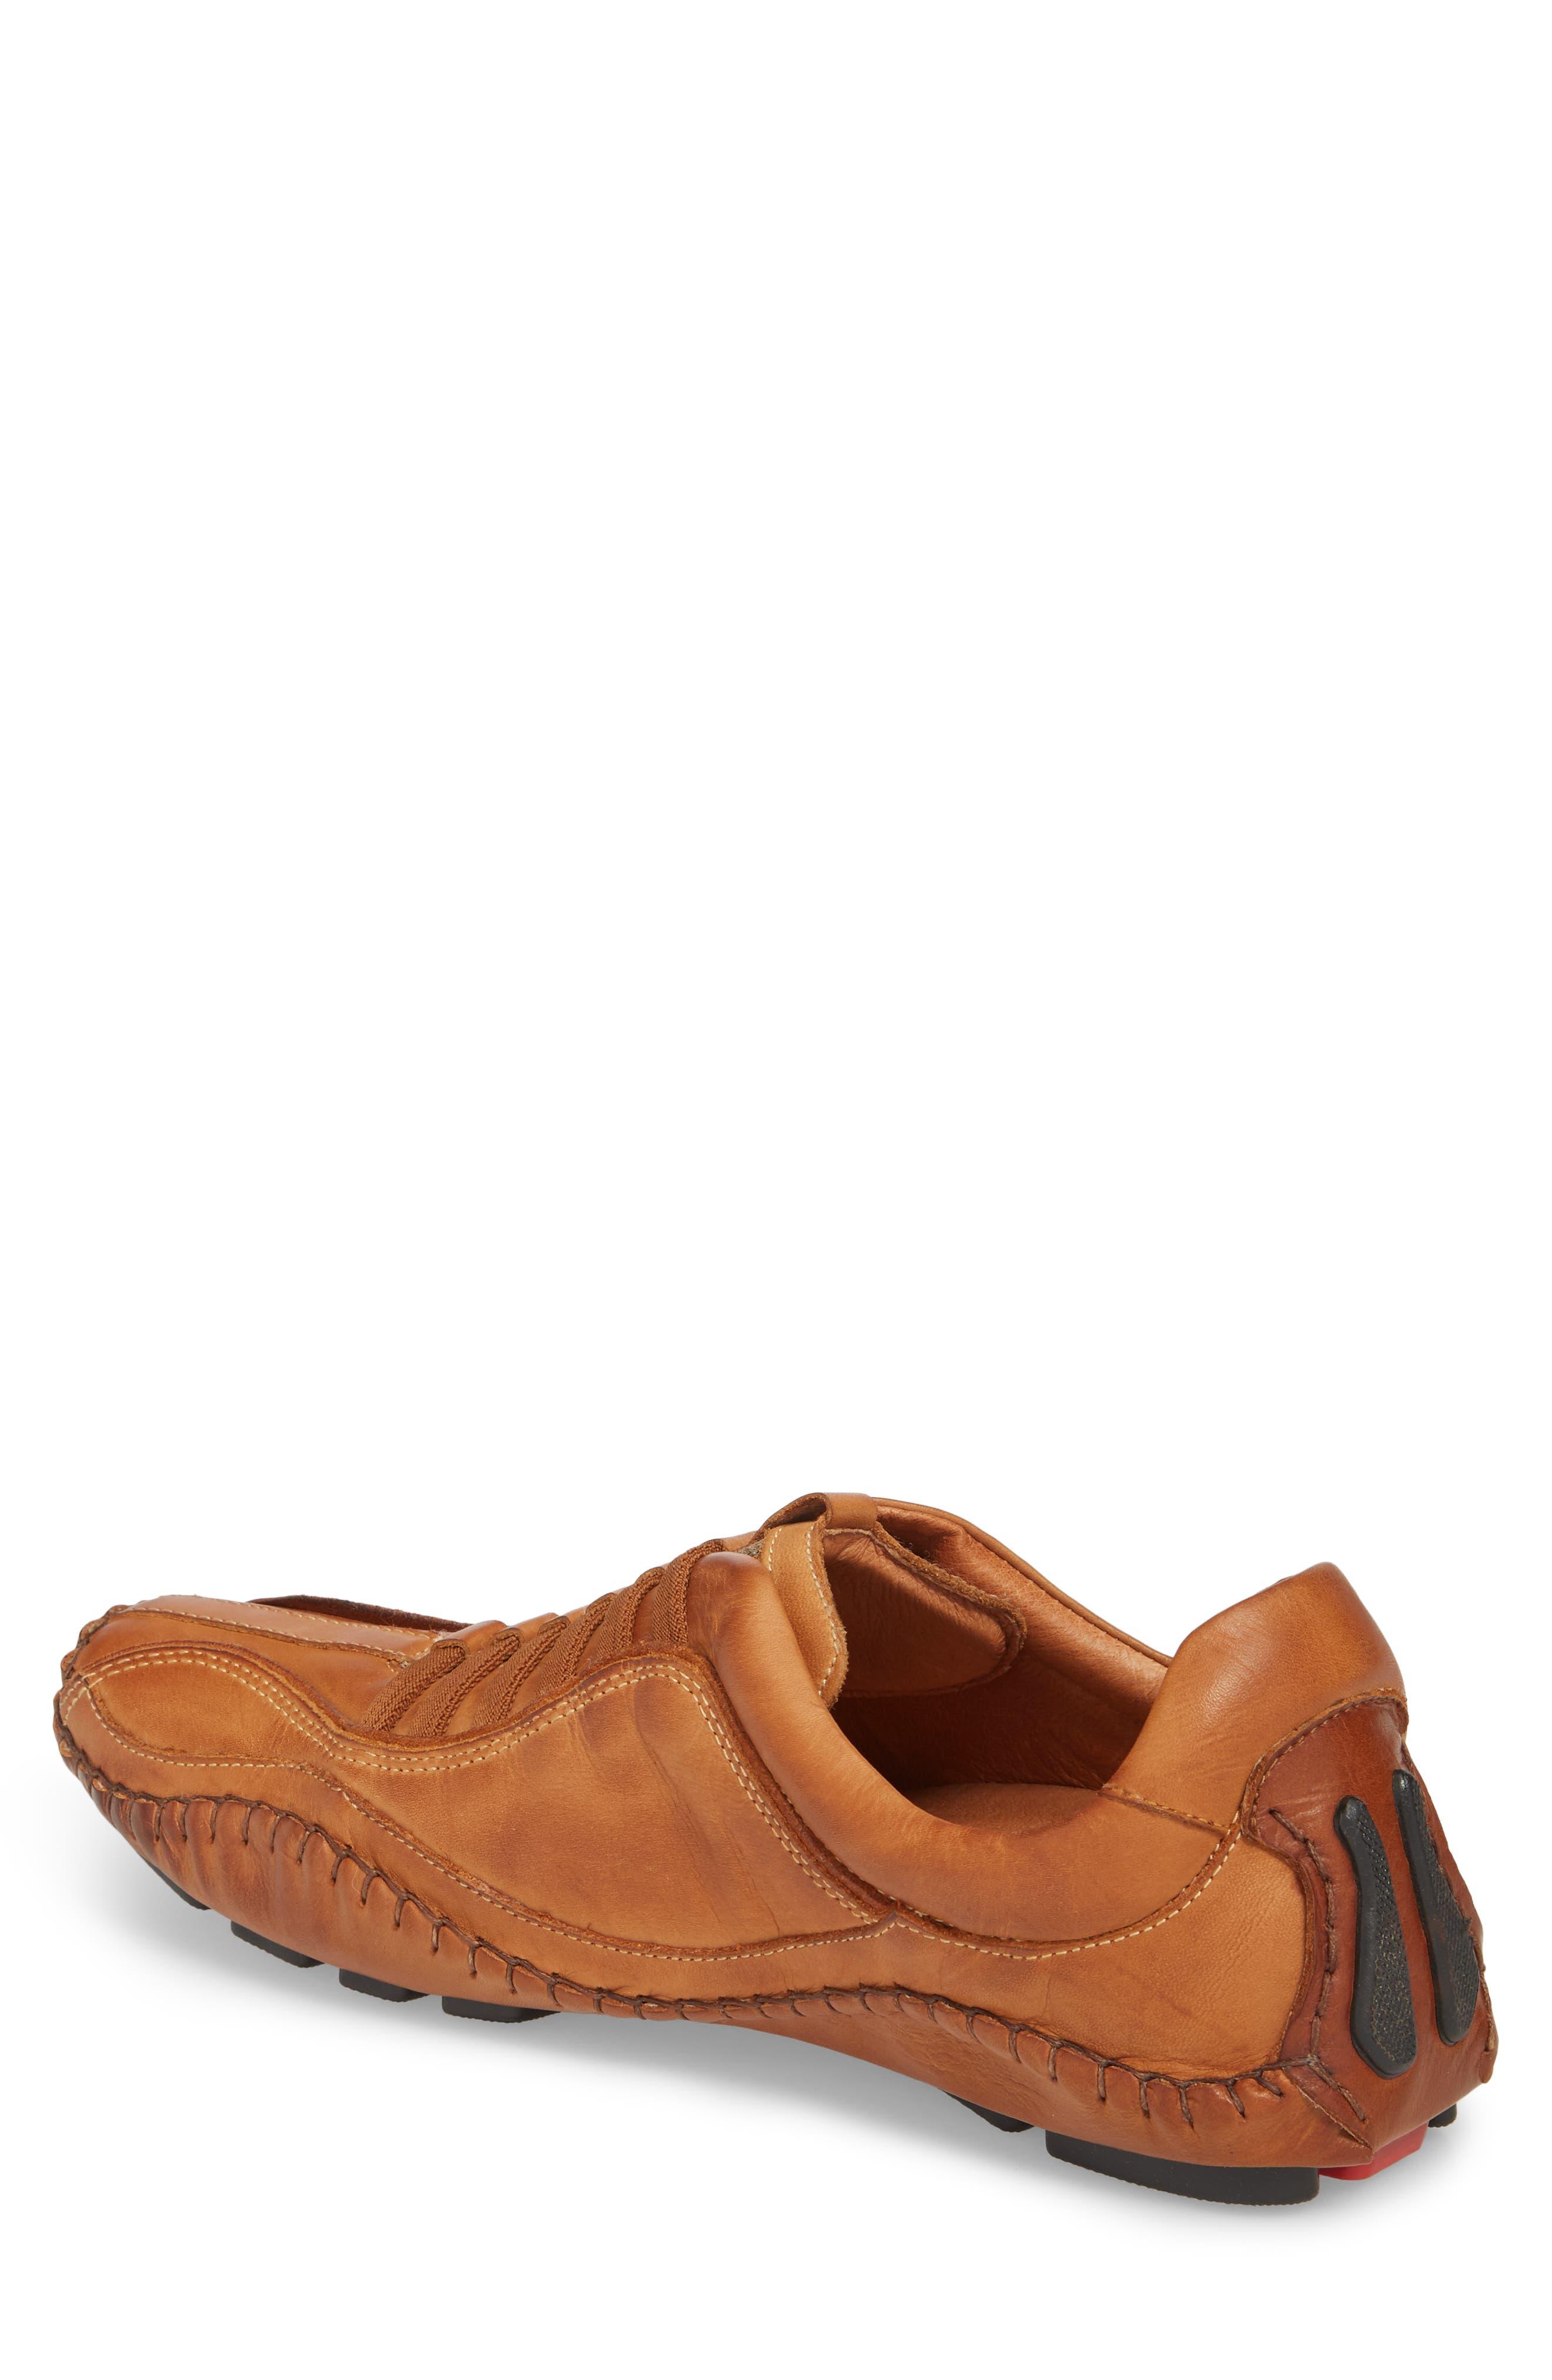 'Fuencarral' Driving Shoe,                             Alternate thumbnail 2, color,                             Light Brown